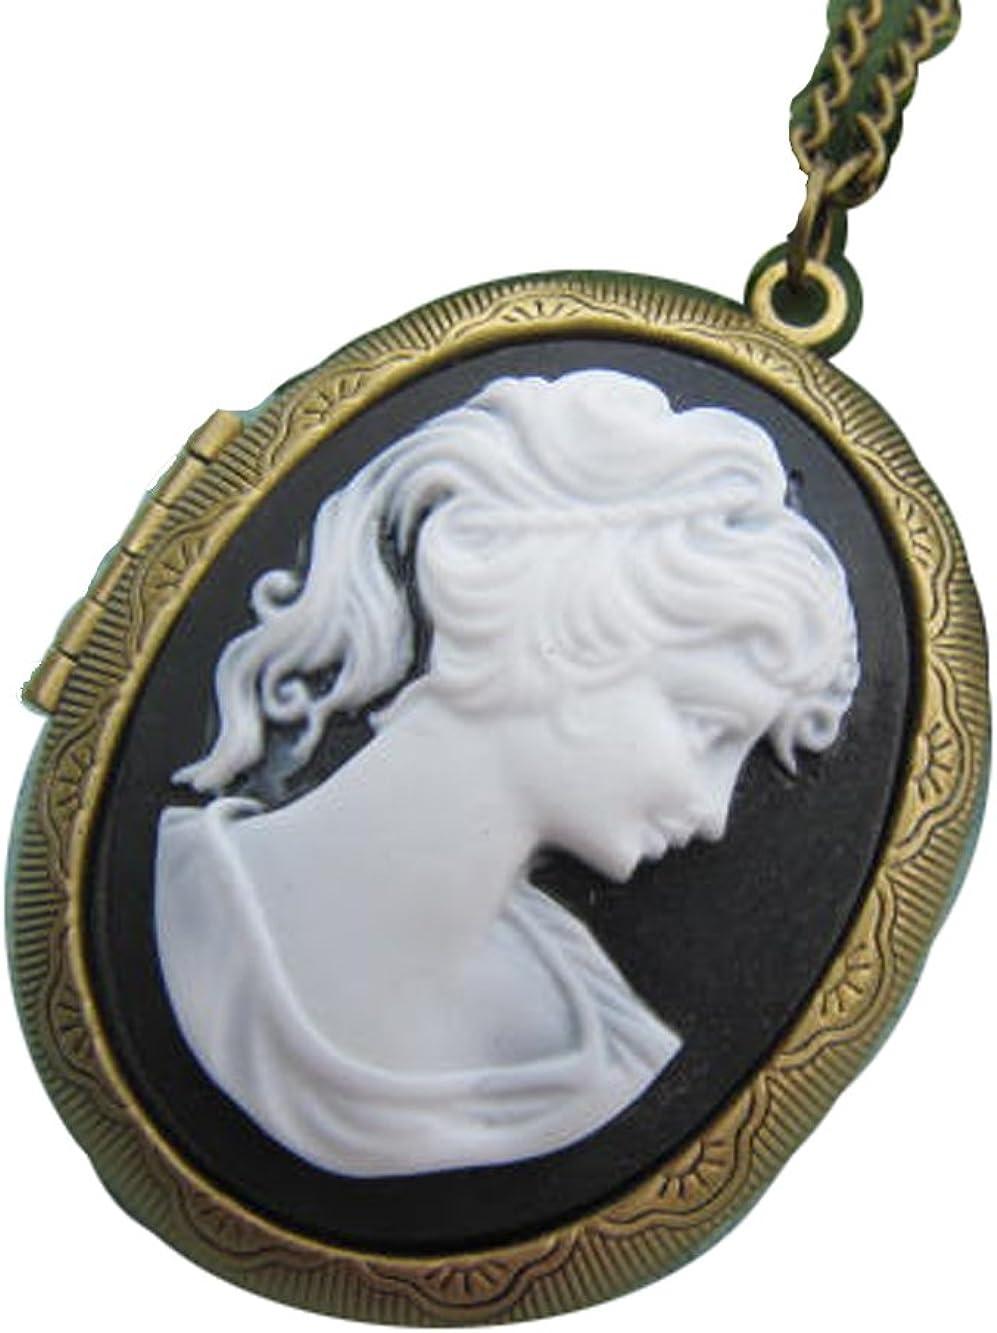 Cameo Locket Necklace Black White Cameo Necklace Vintage Lady Cameo Photo Locket Large Oval Locket